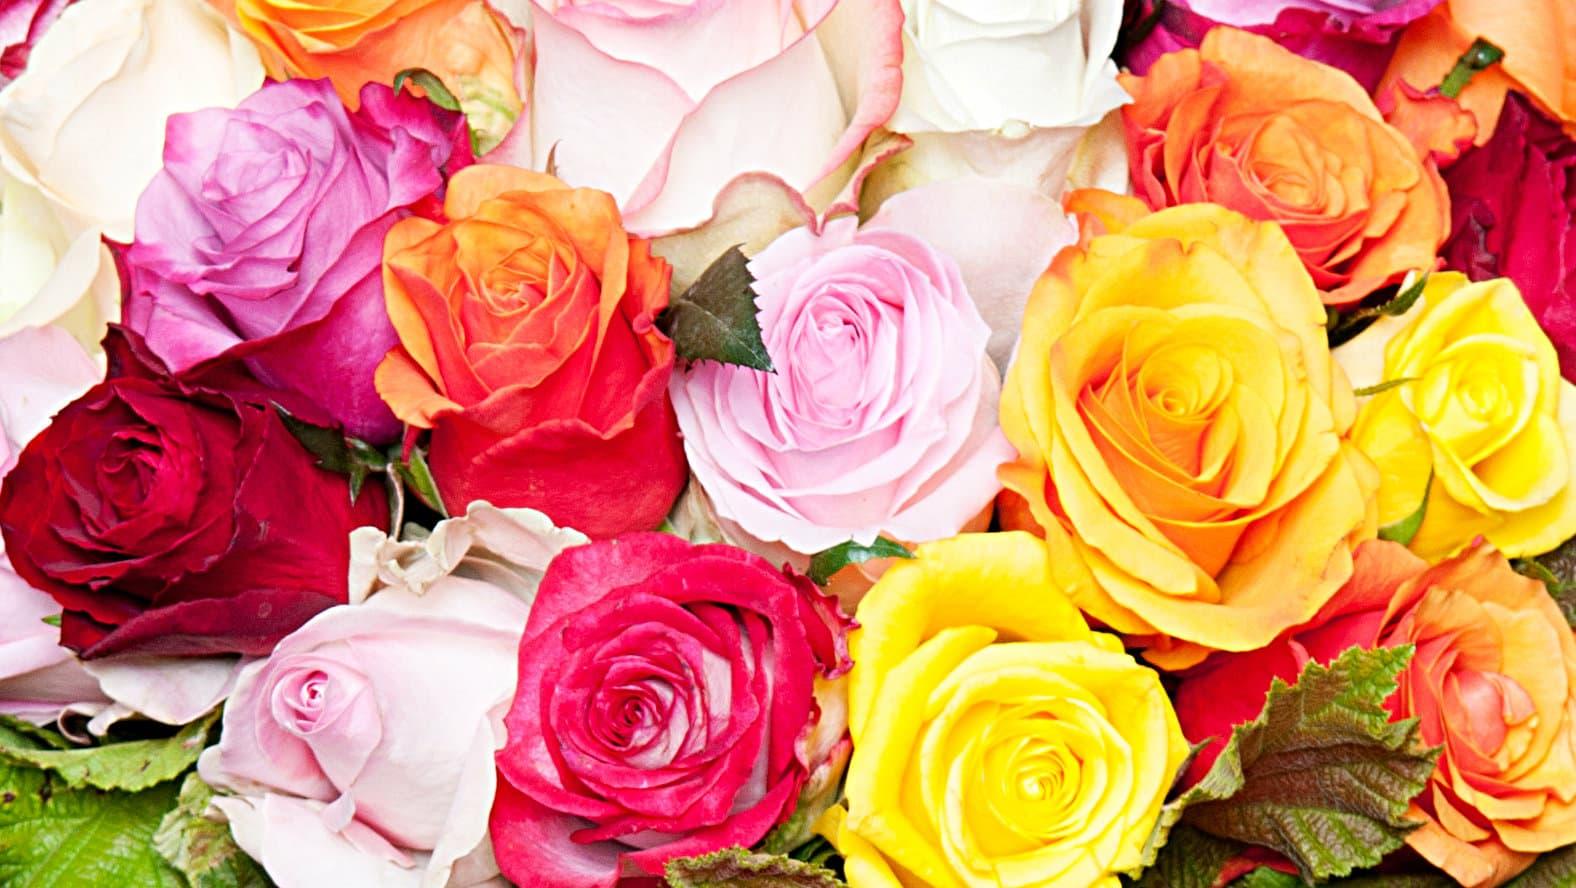 sunshine-rose-mix-flowers-tation-min.jpg